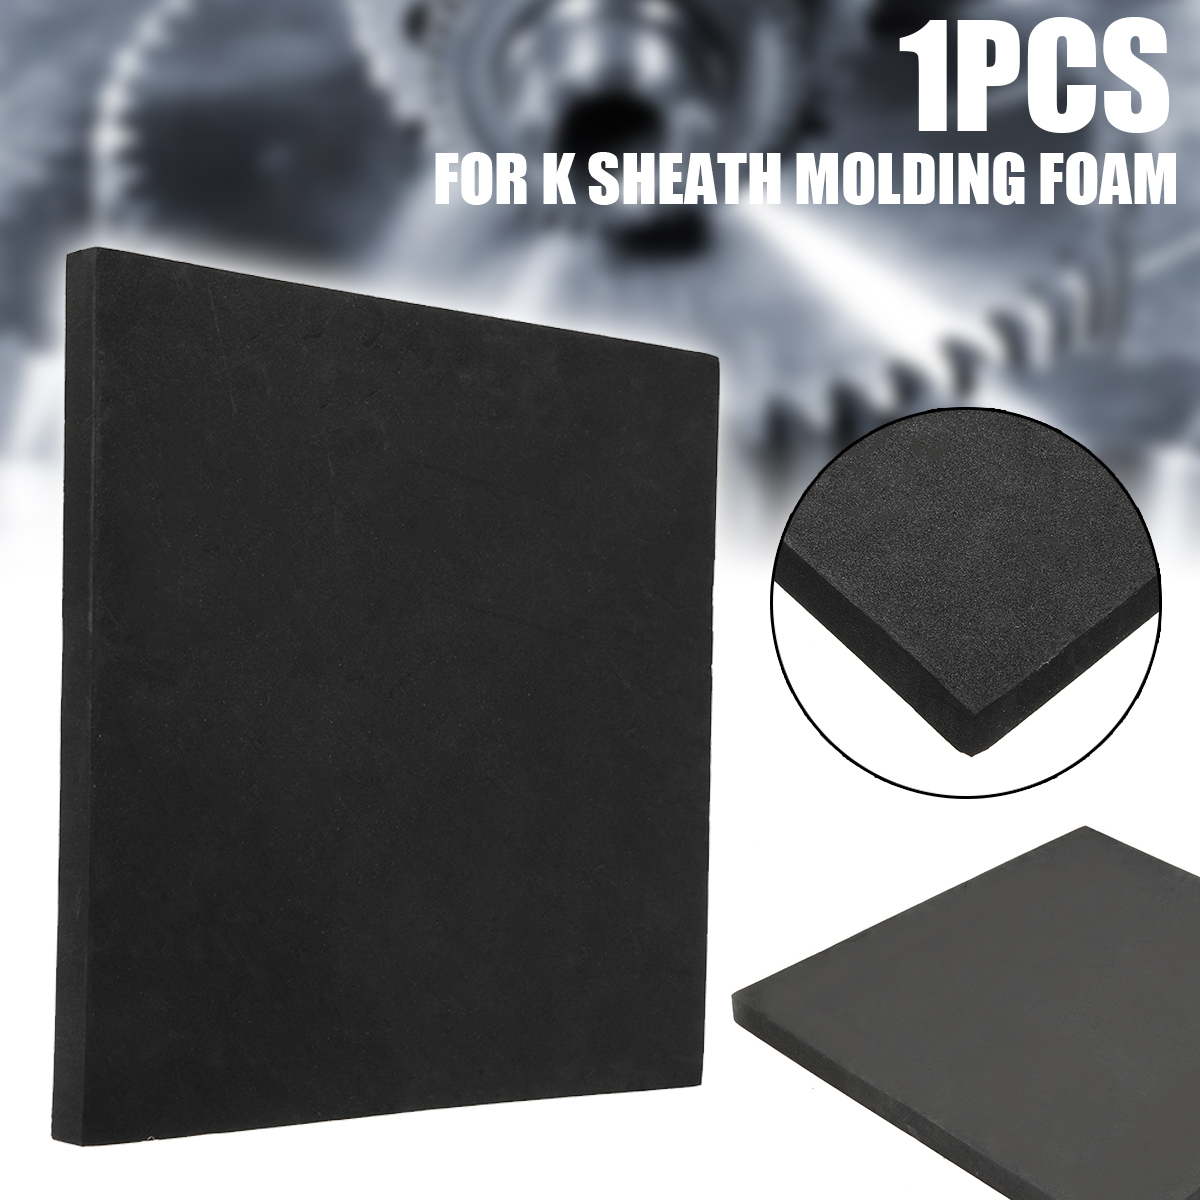 320*320*20mm EVA Adhesive Foam Black K Sheath Molding Foam Kydex Produce K Sheath DQK Kydex Produce K Sheath Accessories Foam